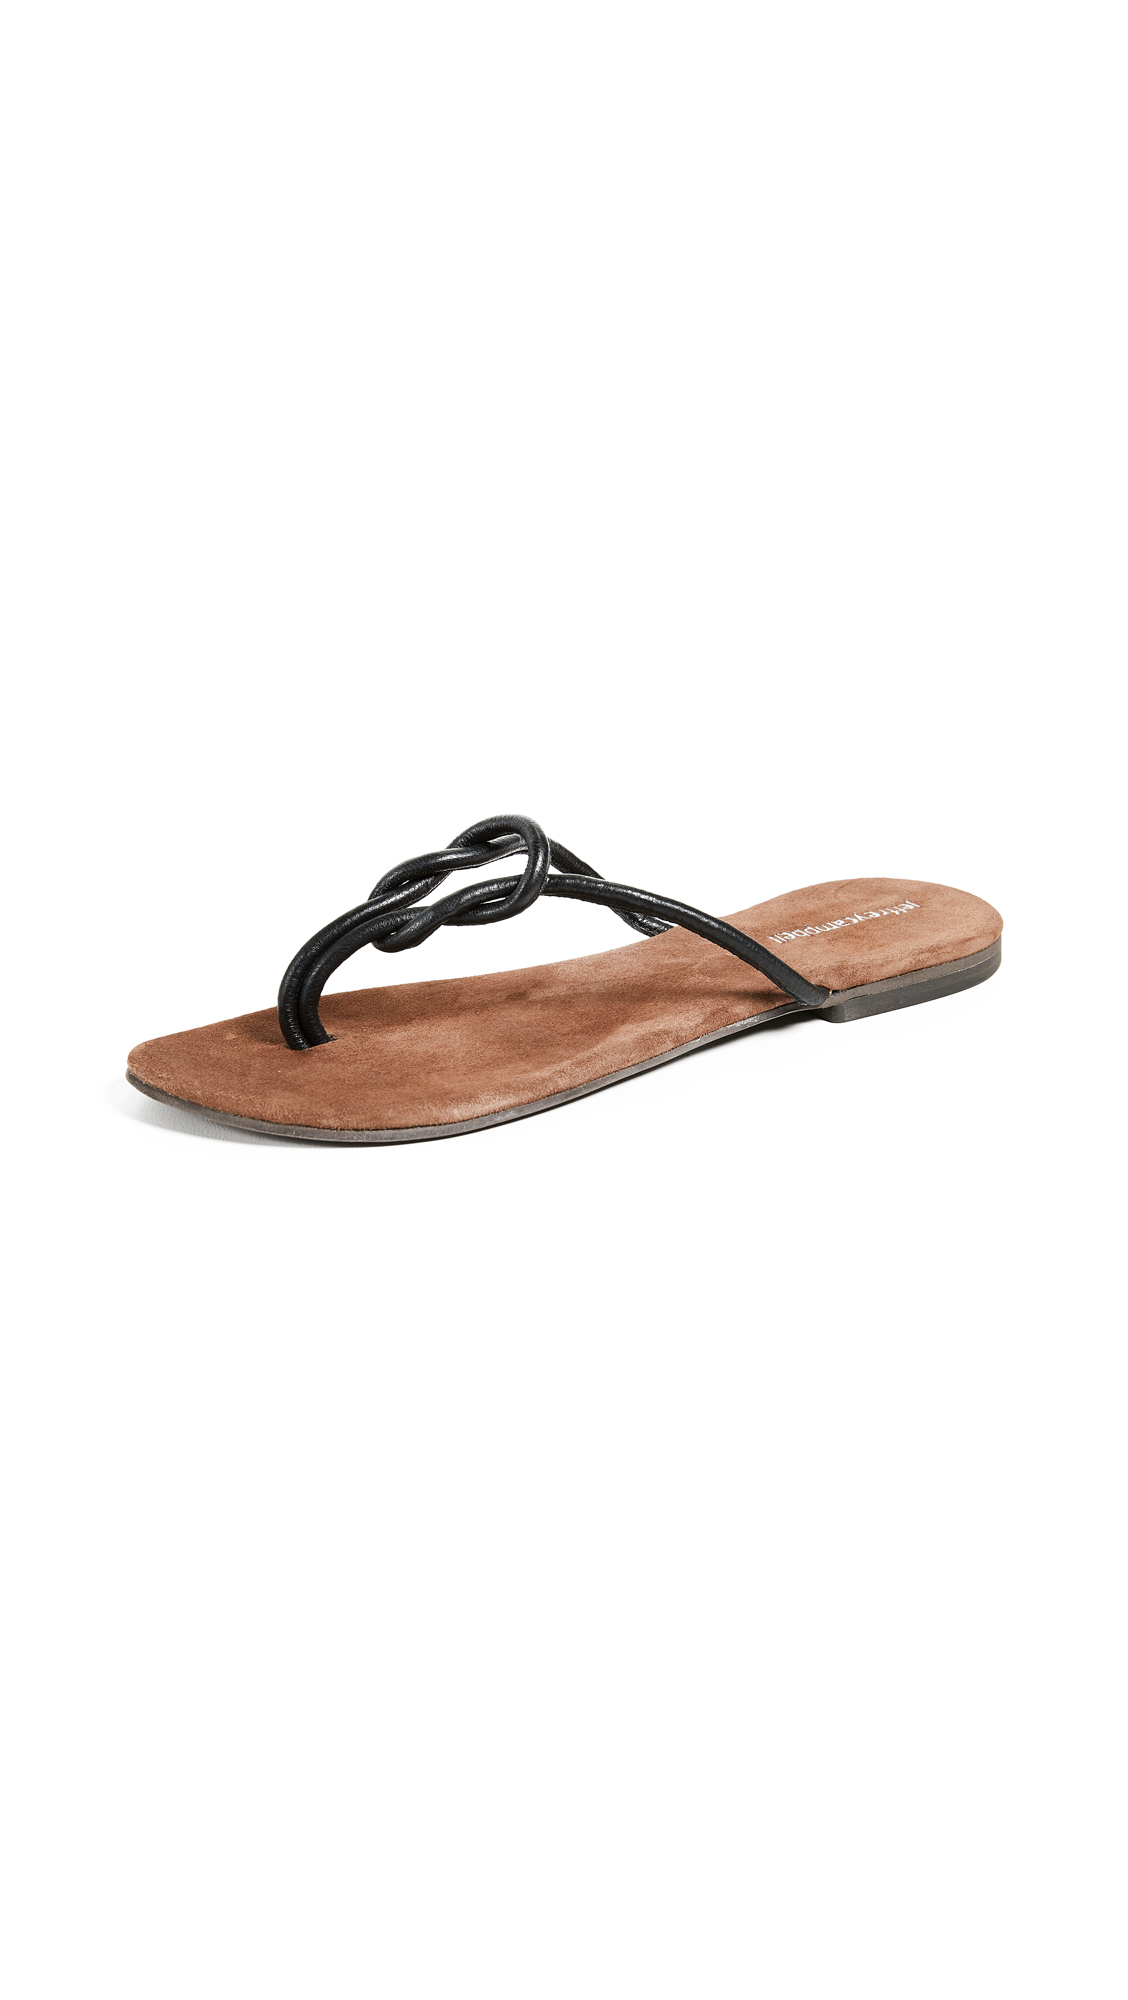 Jeffrey Campbell Malia Flip Flops